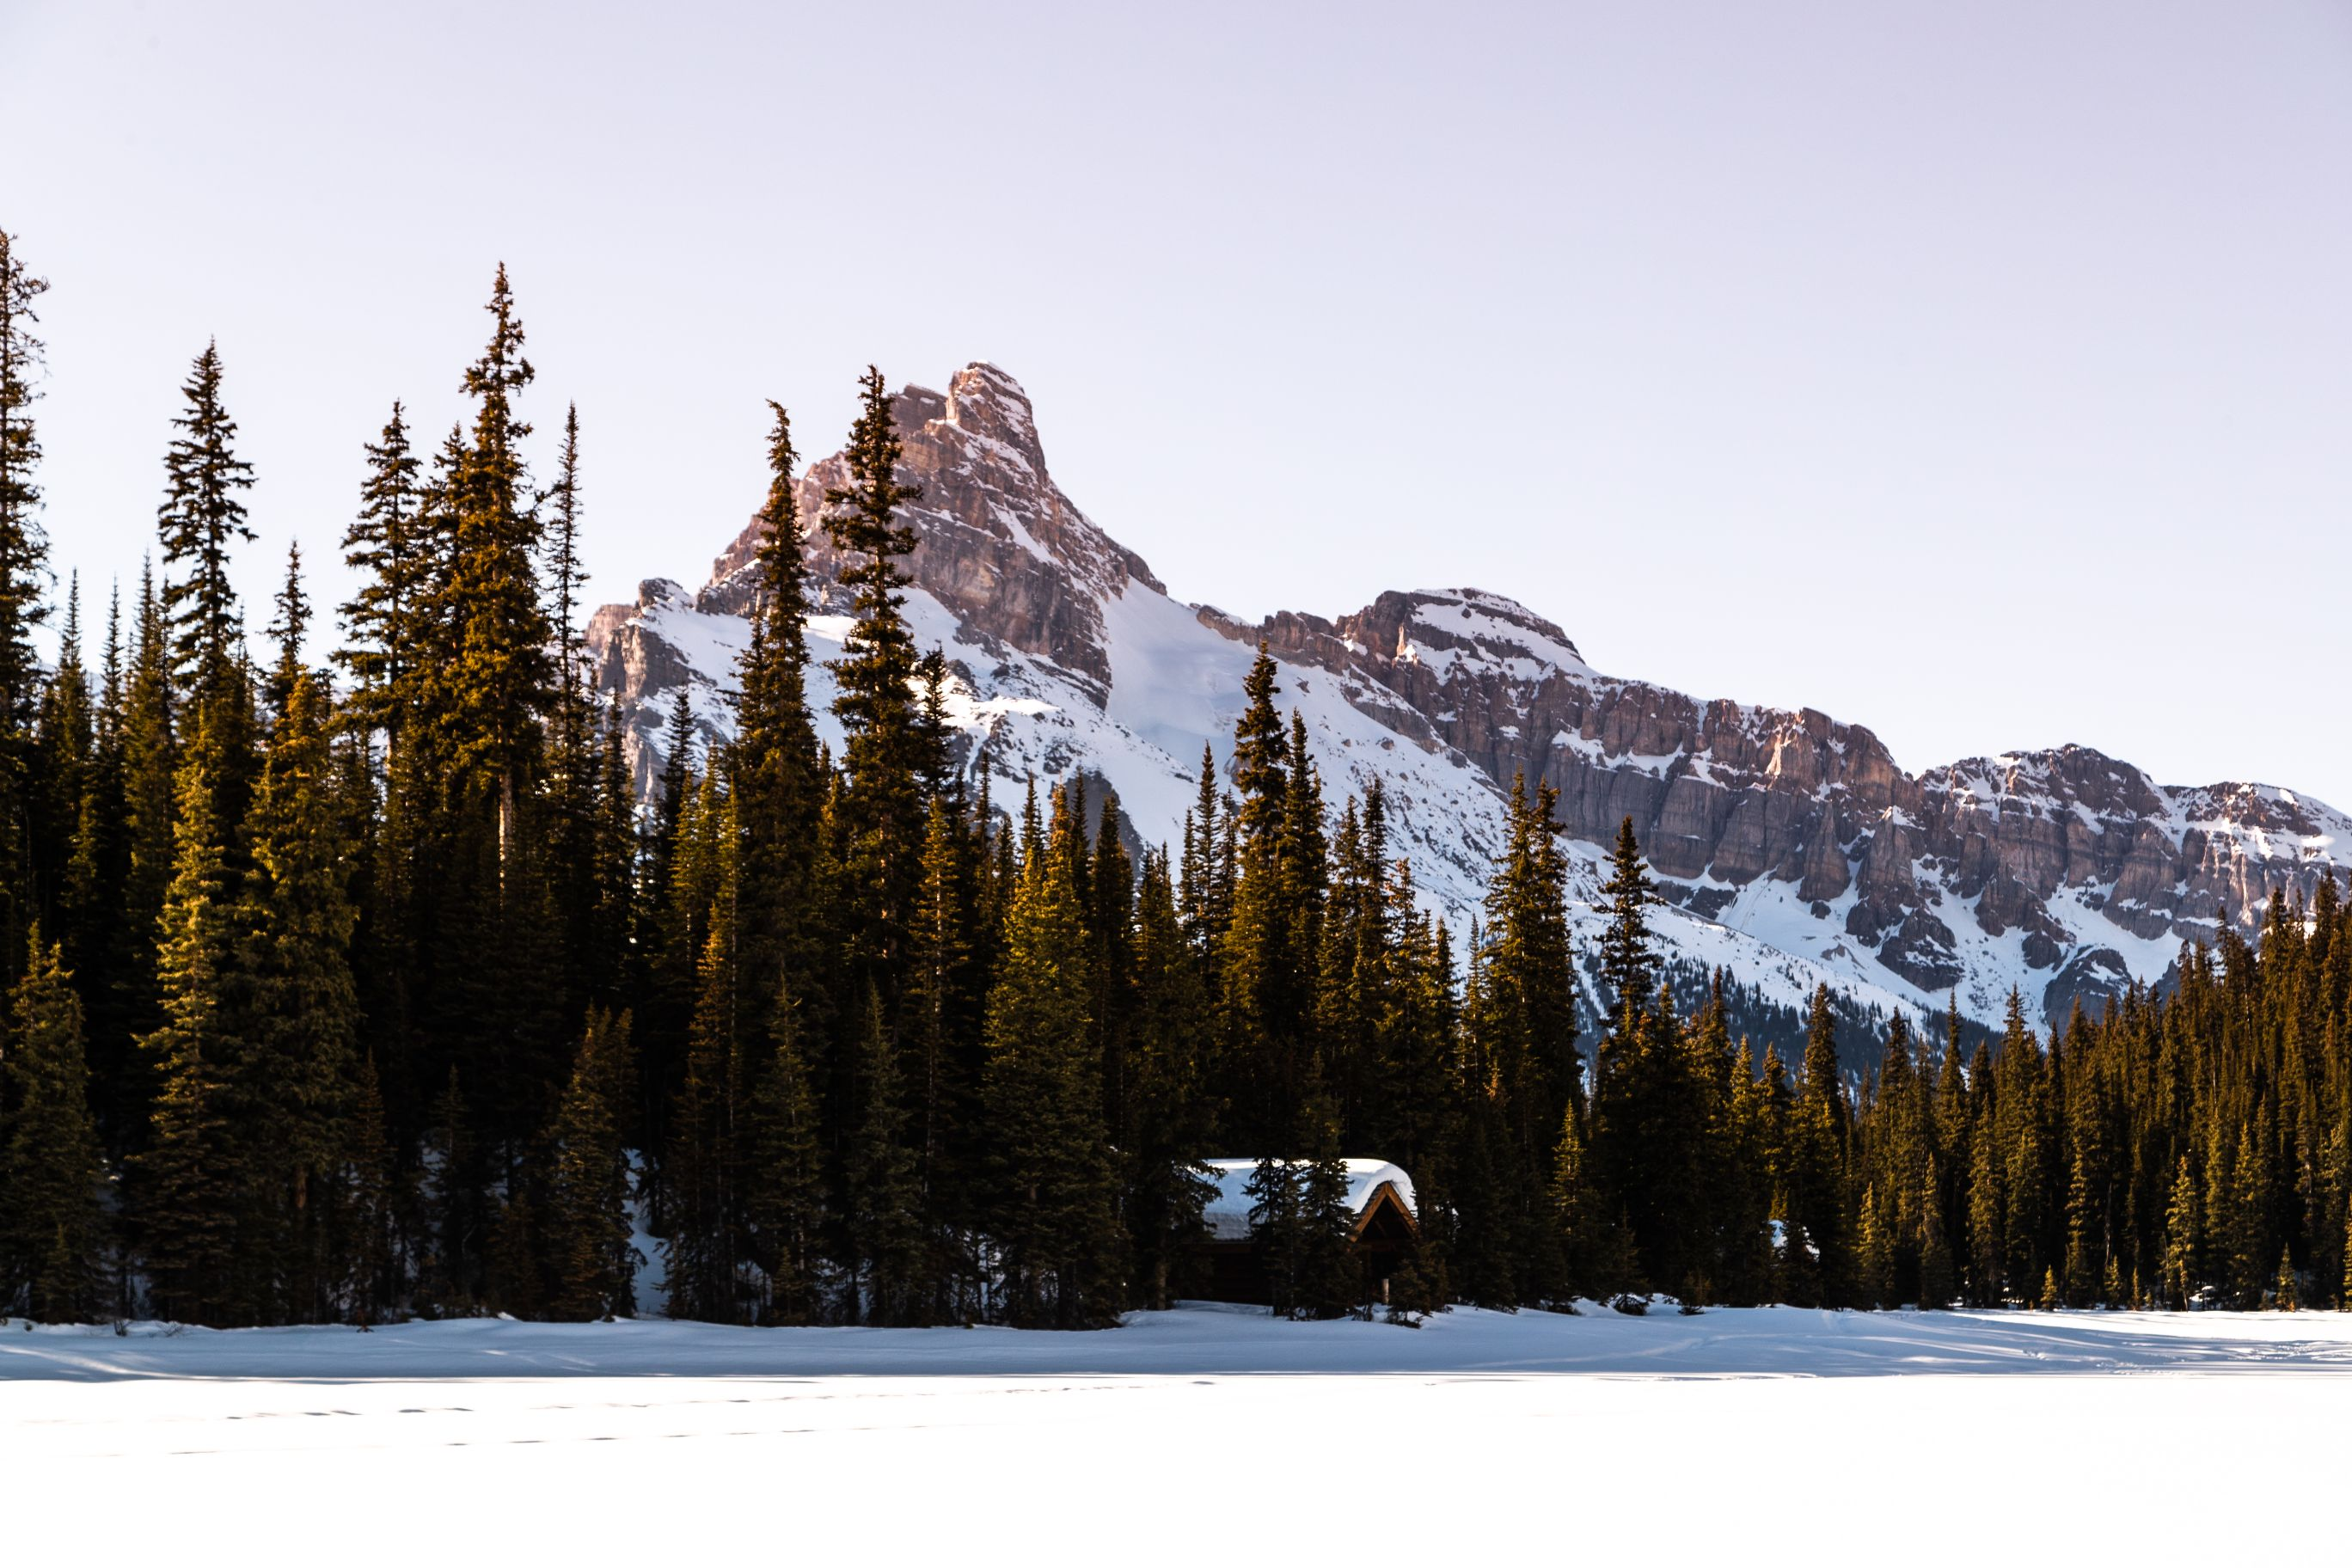 Snowy log cabin poking through evergreens